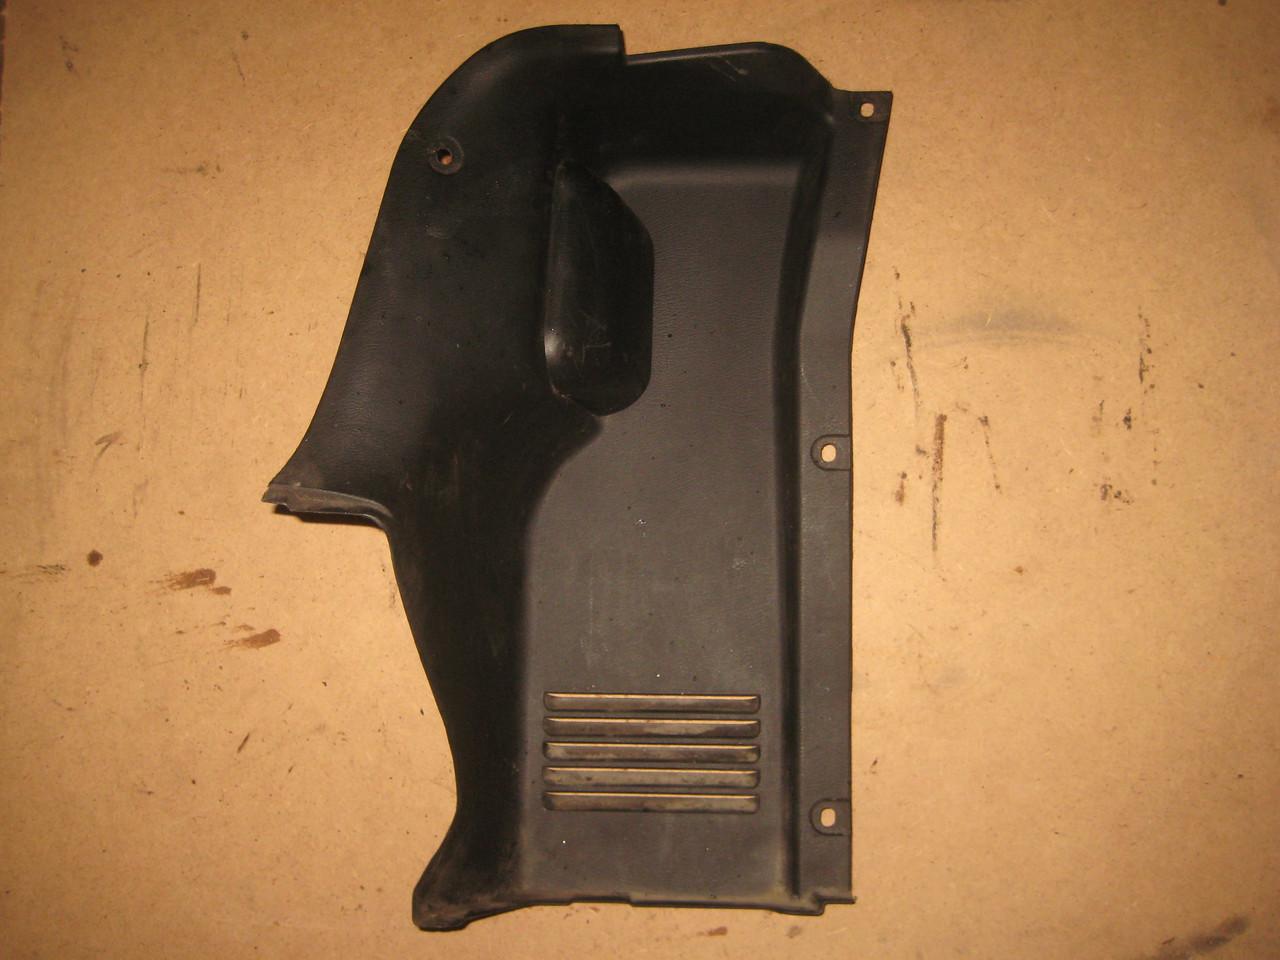 Накладка обивка багажника фонаря задняя левая Daewoo Lanos Sens Деу Део Ланос Сенс